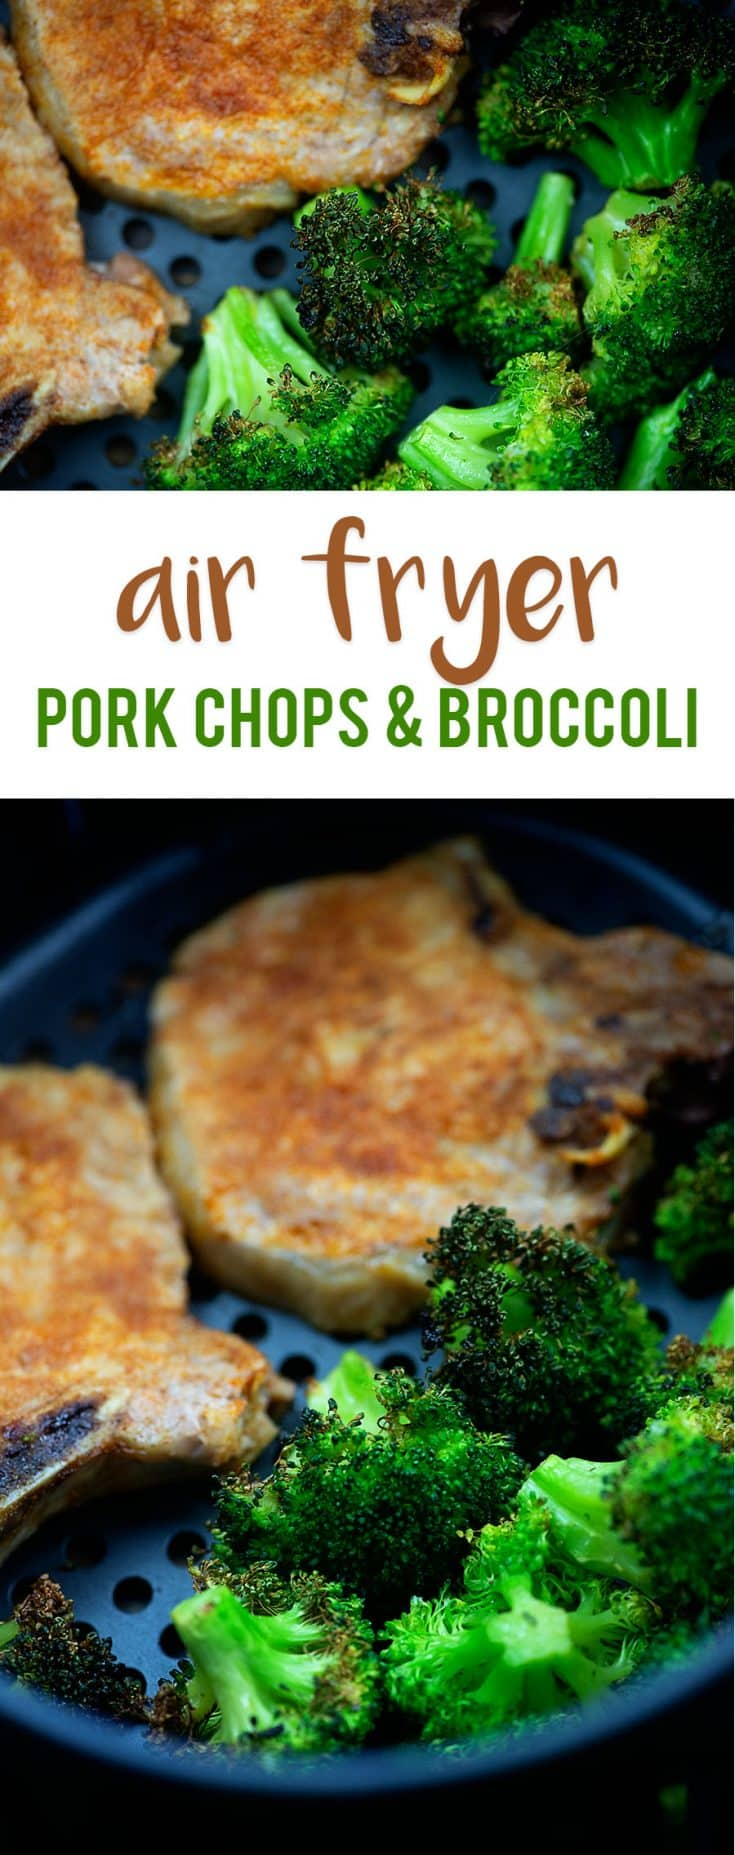 Air Fryer Pork Chops and Broccoli! Perfectly juicy pork chops and roasted broccoli all at once! #airfryer #porkchops #broccoli #easy